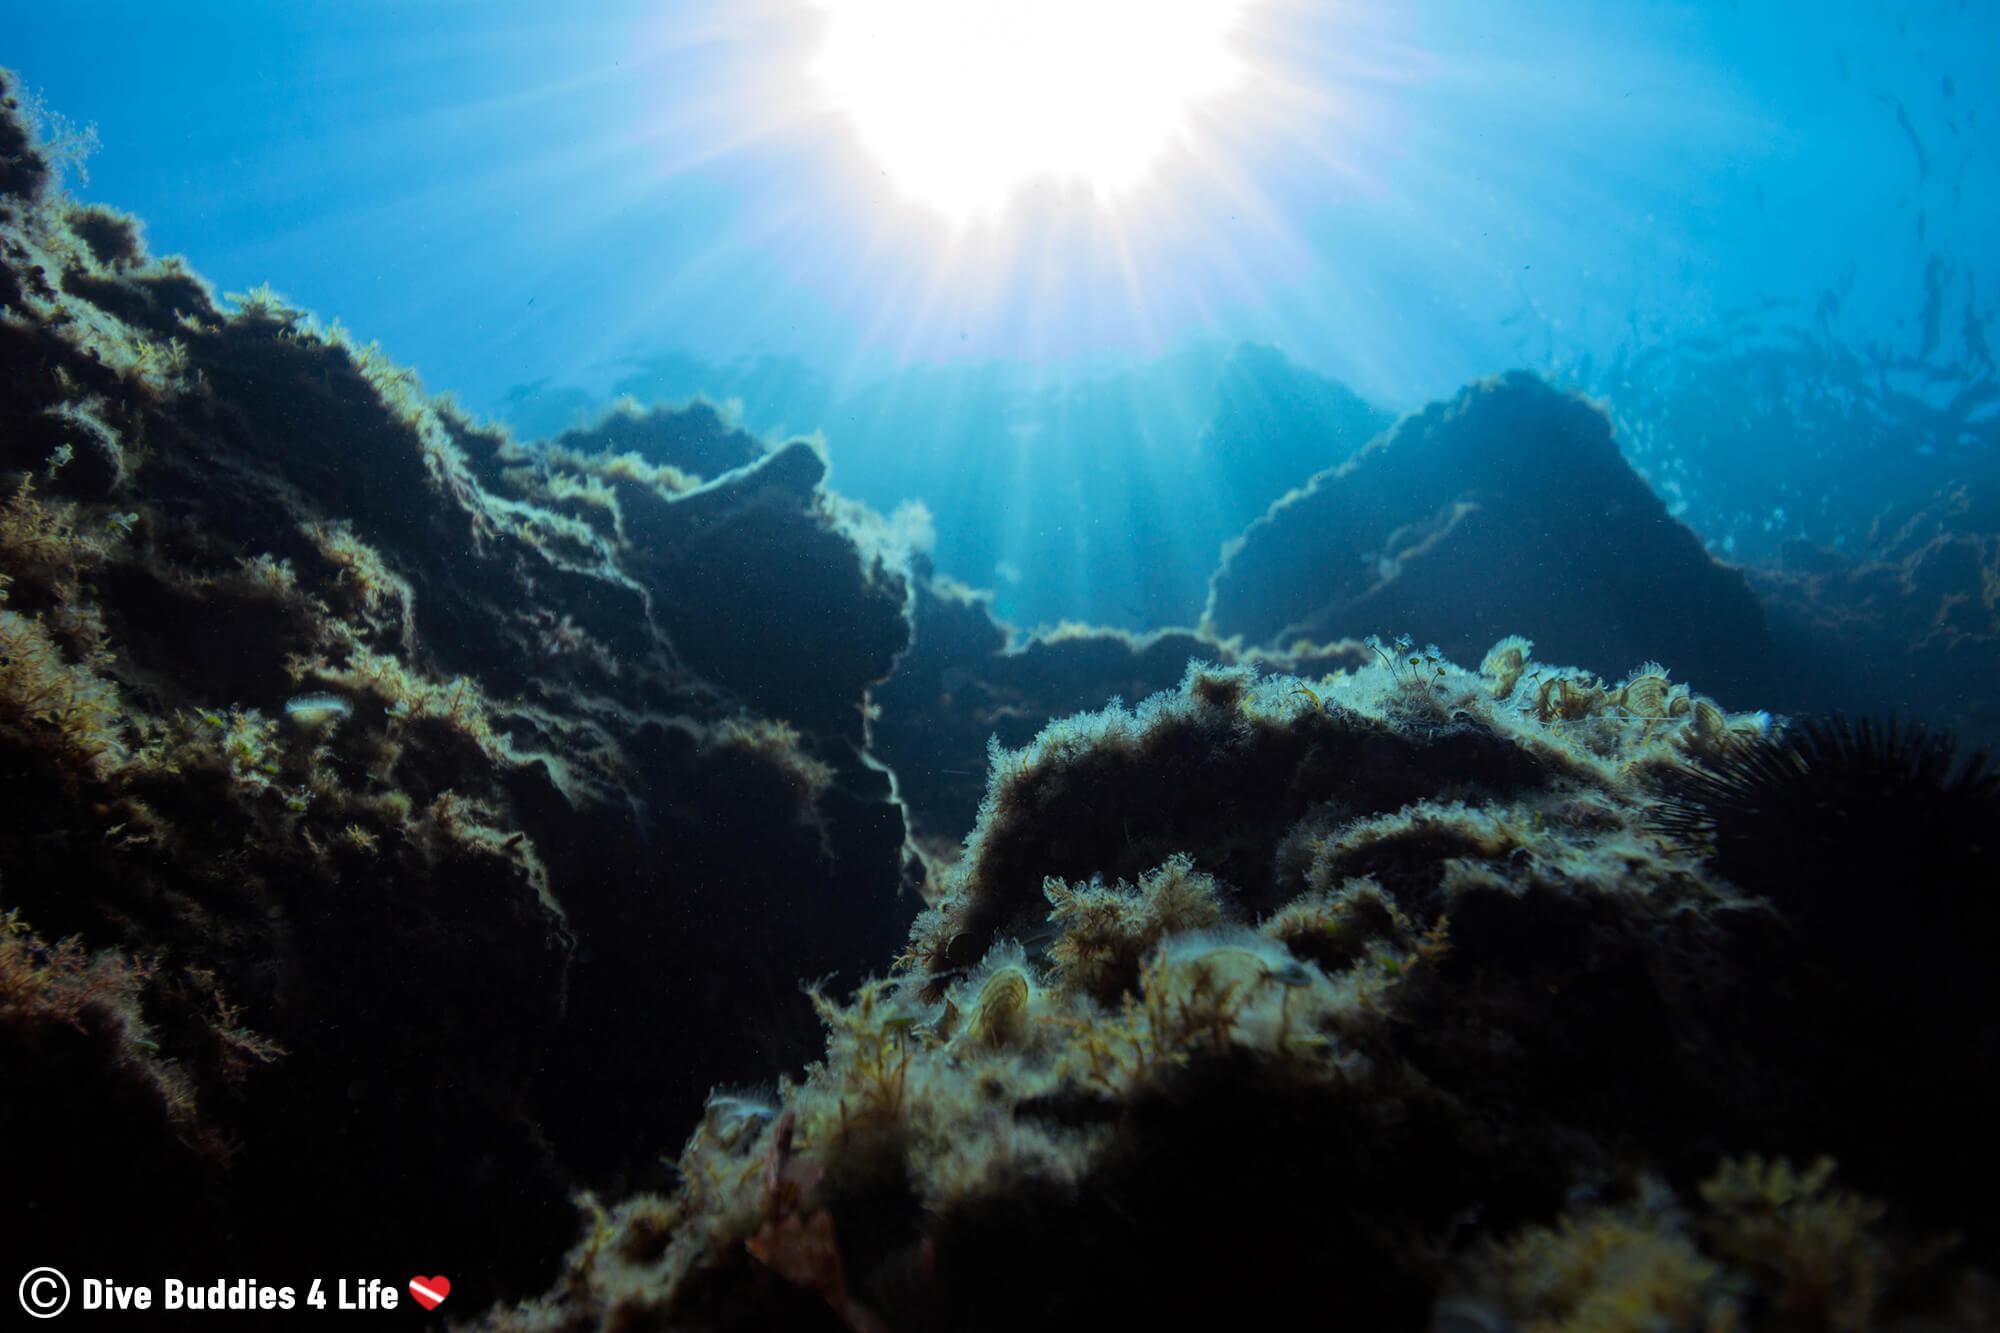 The Rocky Underwater Sea Escarpment Of Dubrovnik, Croatia, Europe